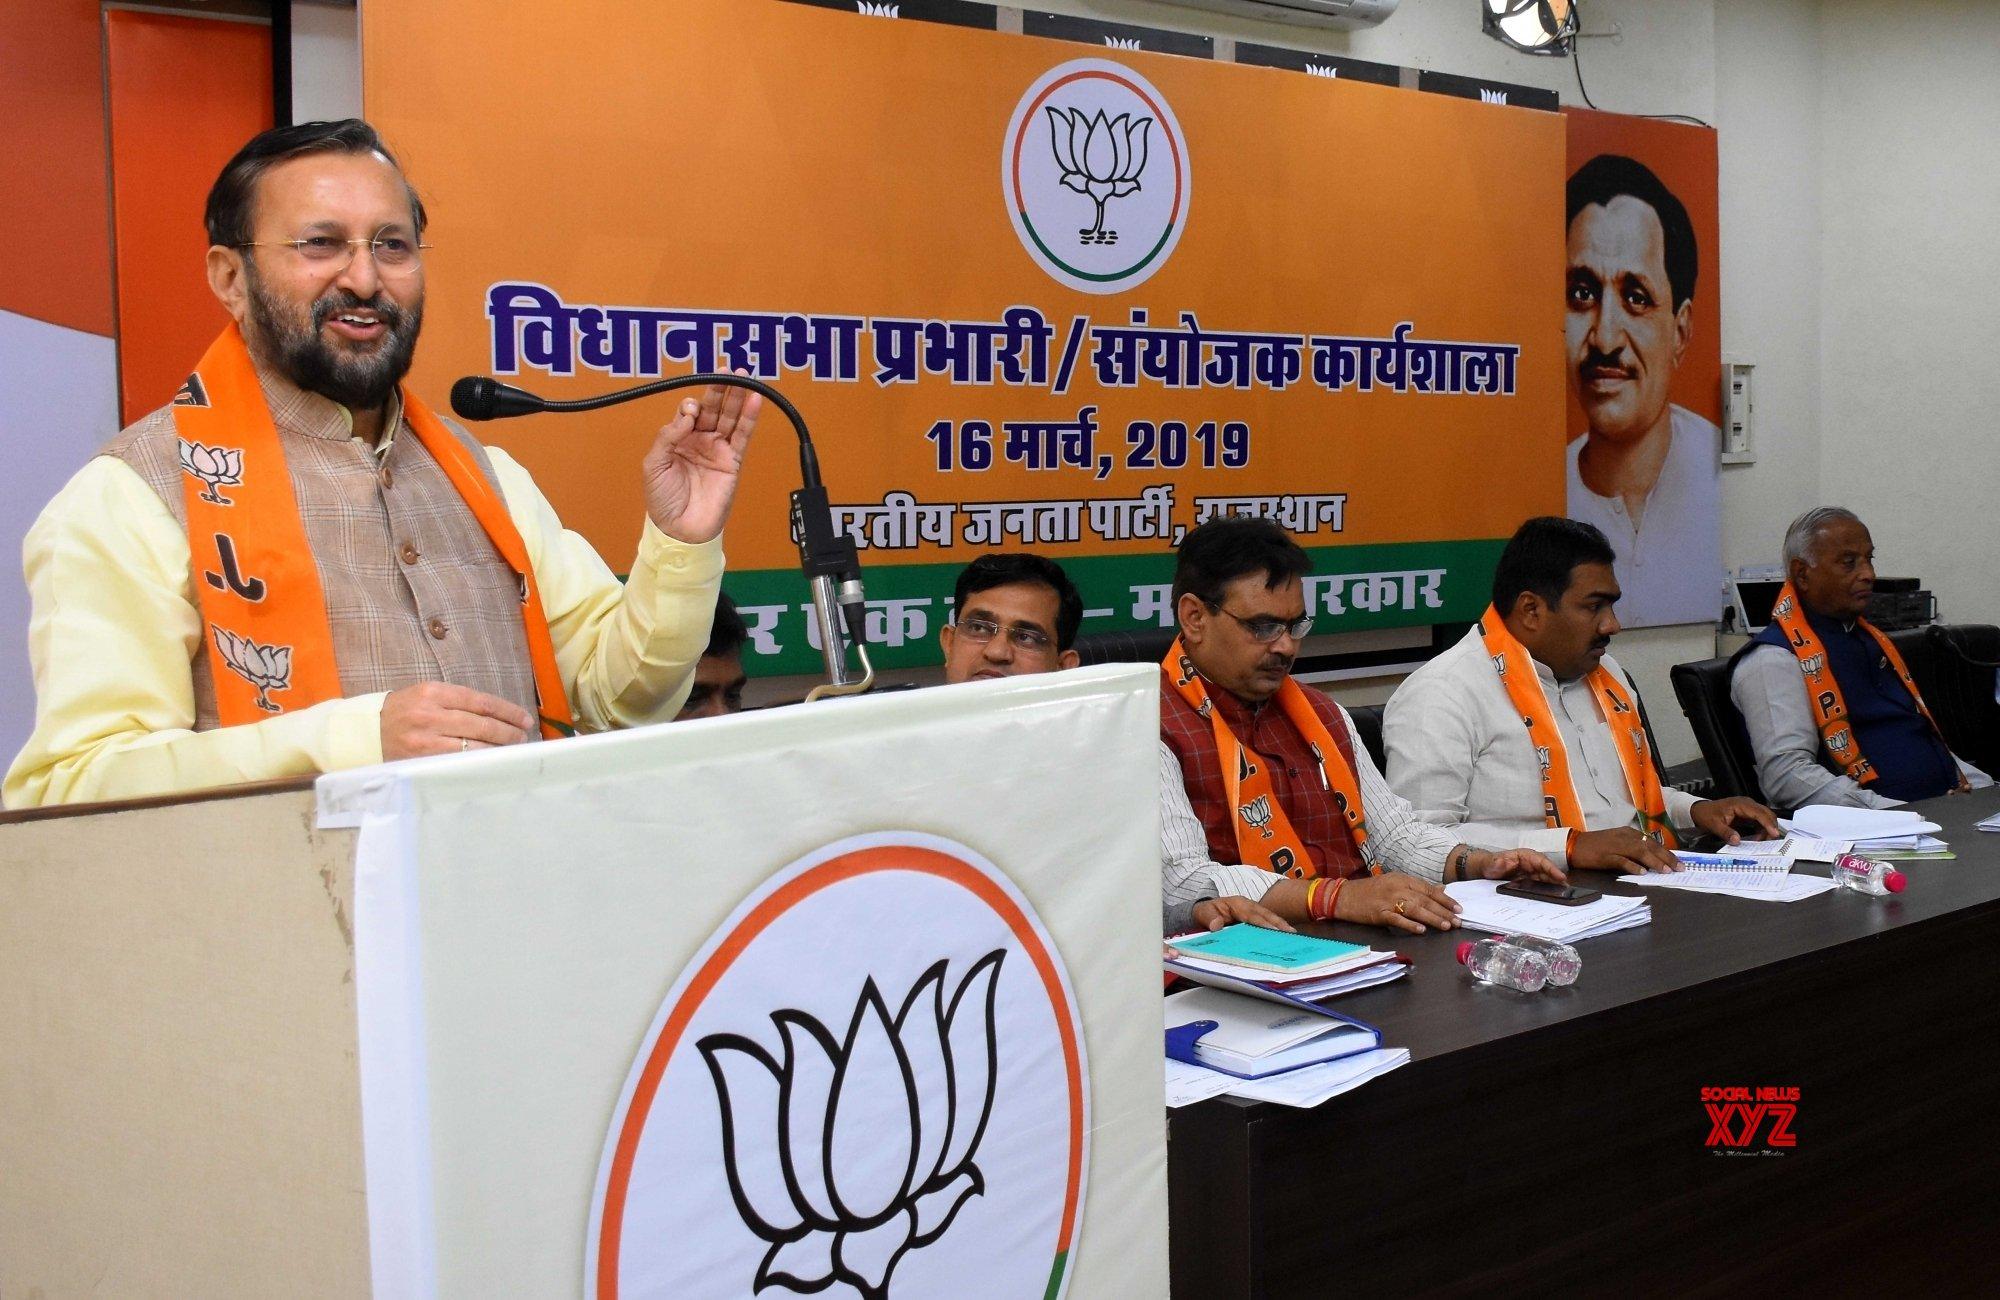 Jaipur: Prakash Javadekar at a BJP meeting #Gallery